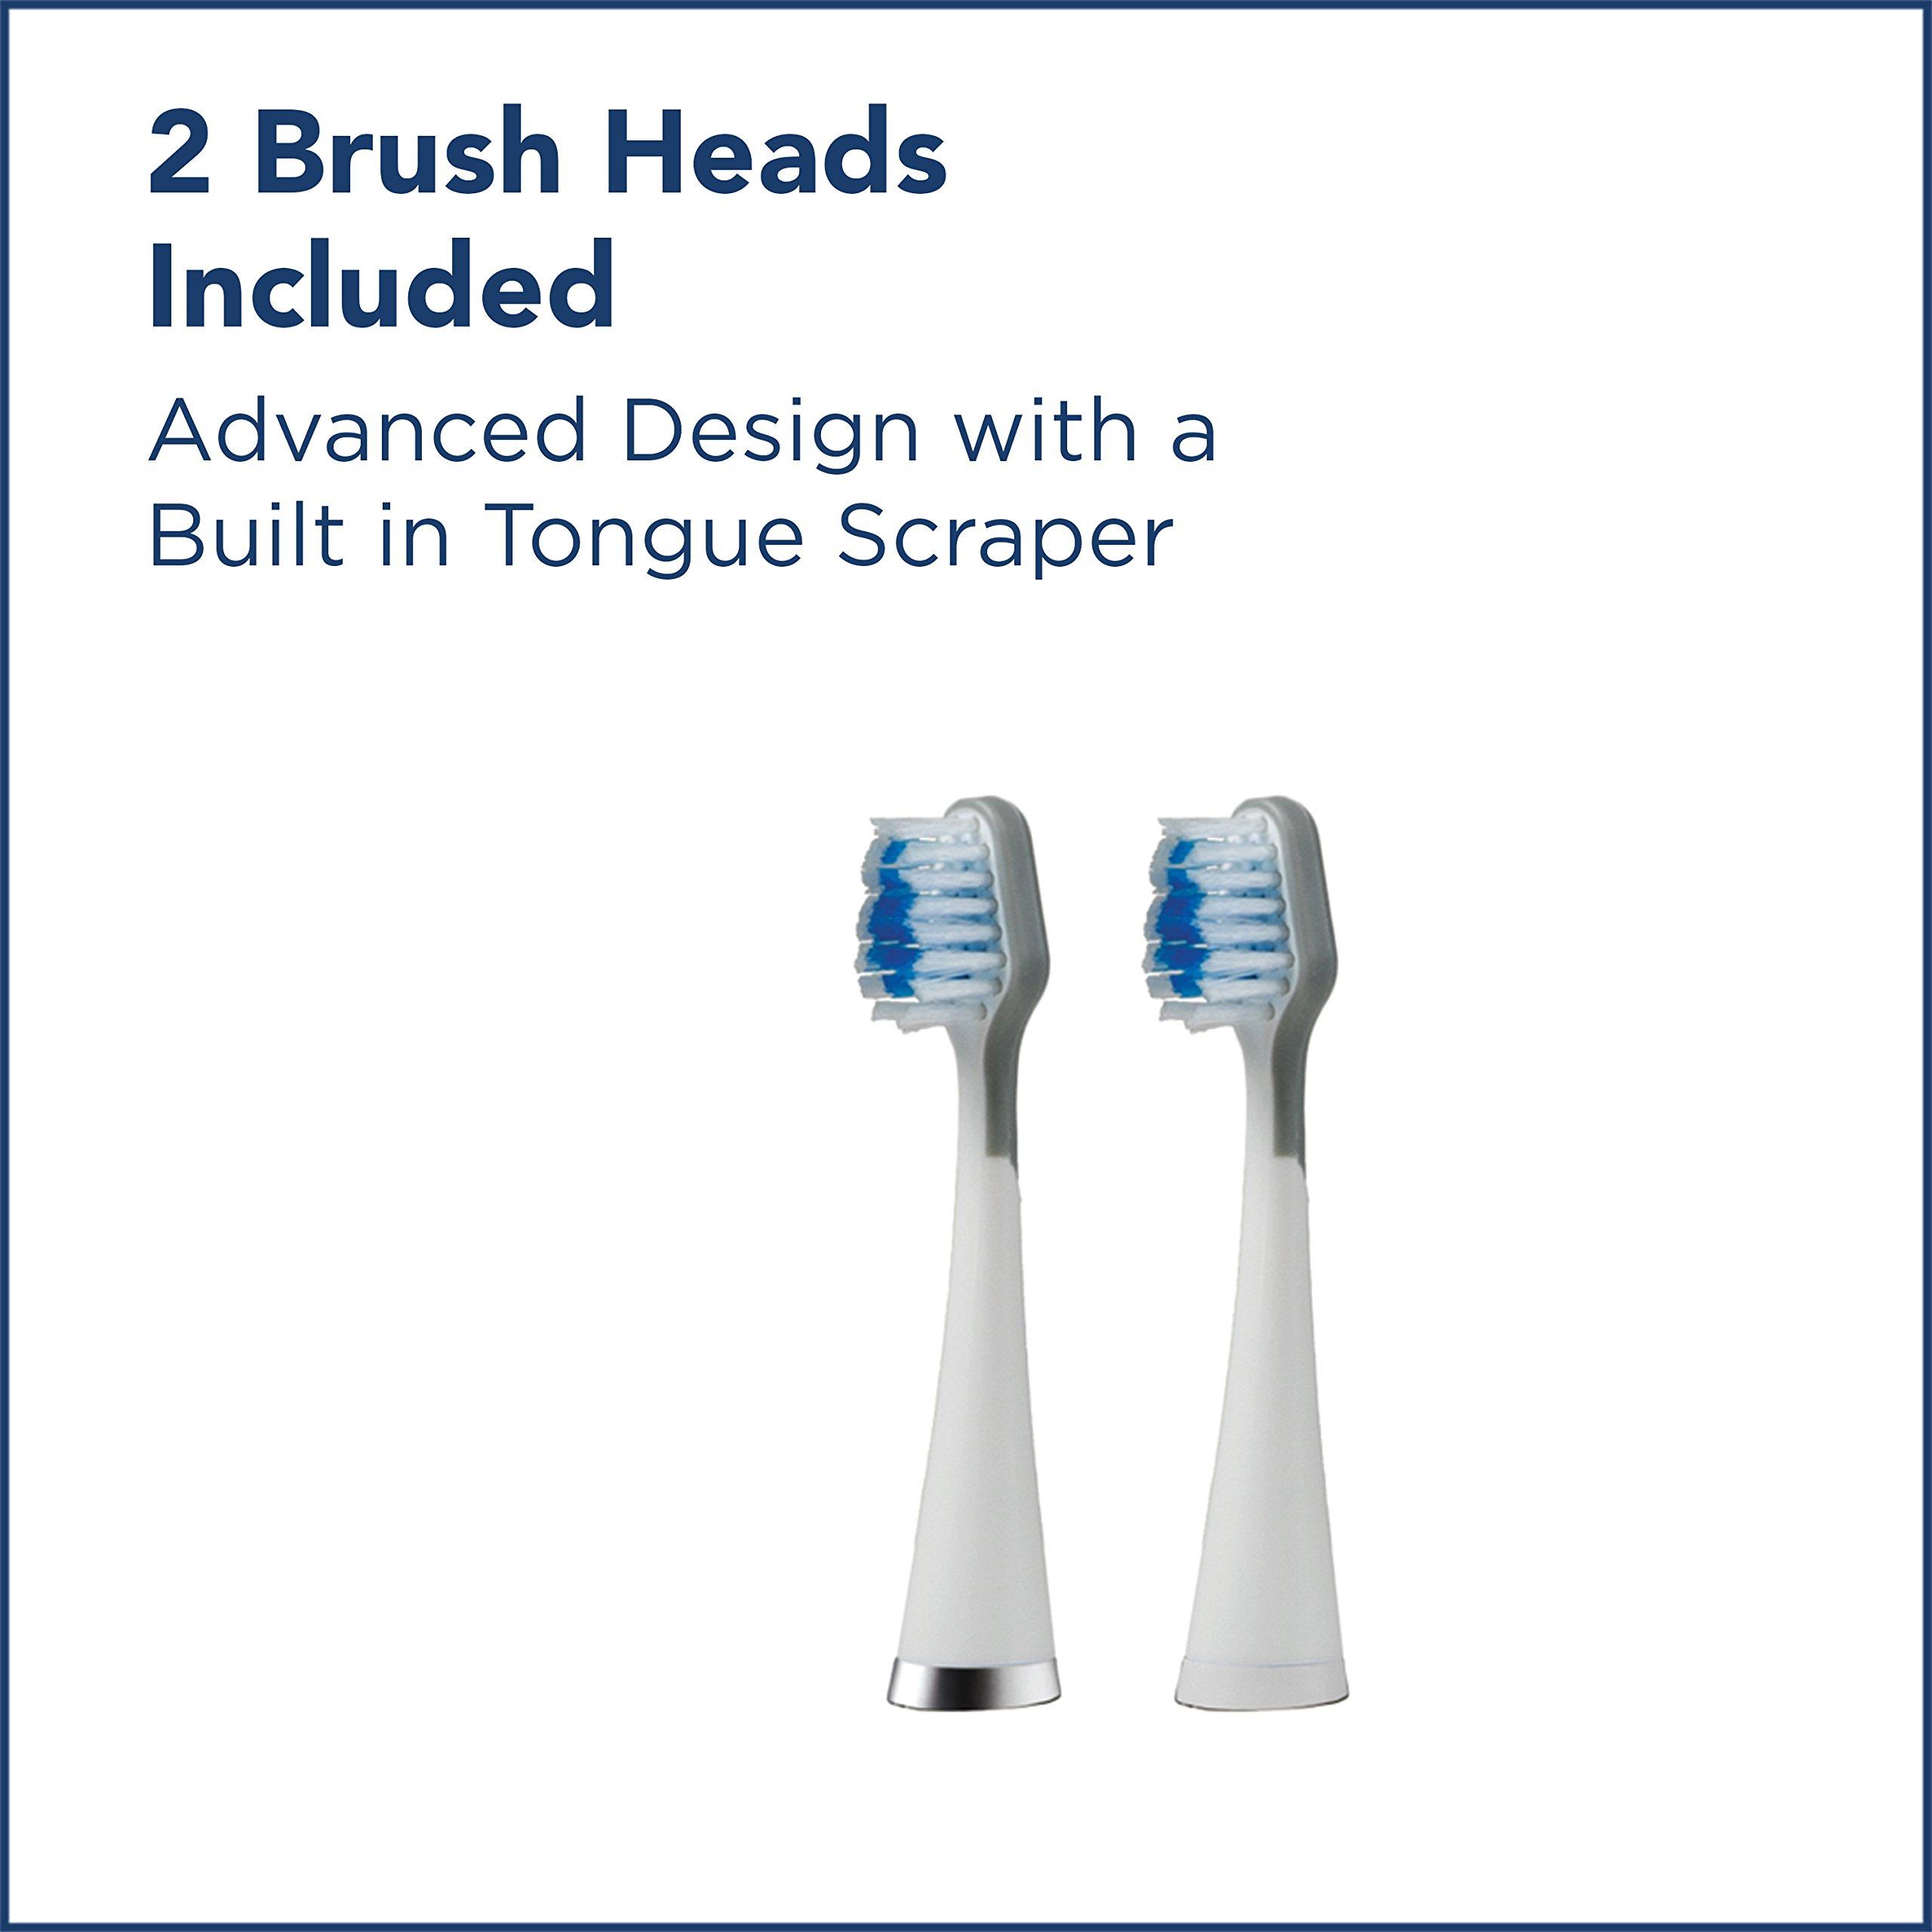 Waterpik Complete Care 9.0 Sonic Electric Toothbrush + Water Flosser, White by Waterpik (Image #15)